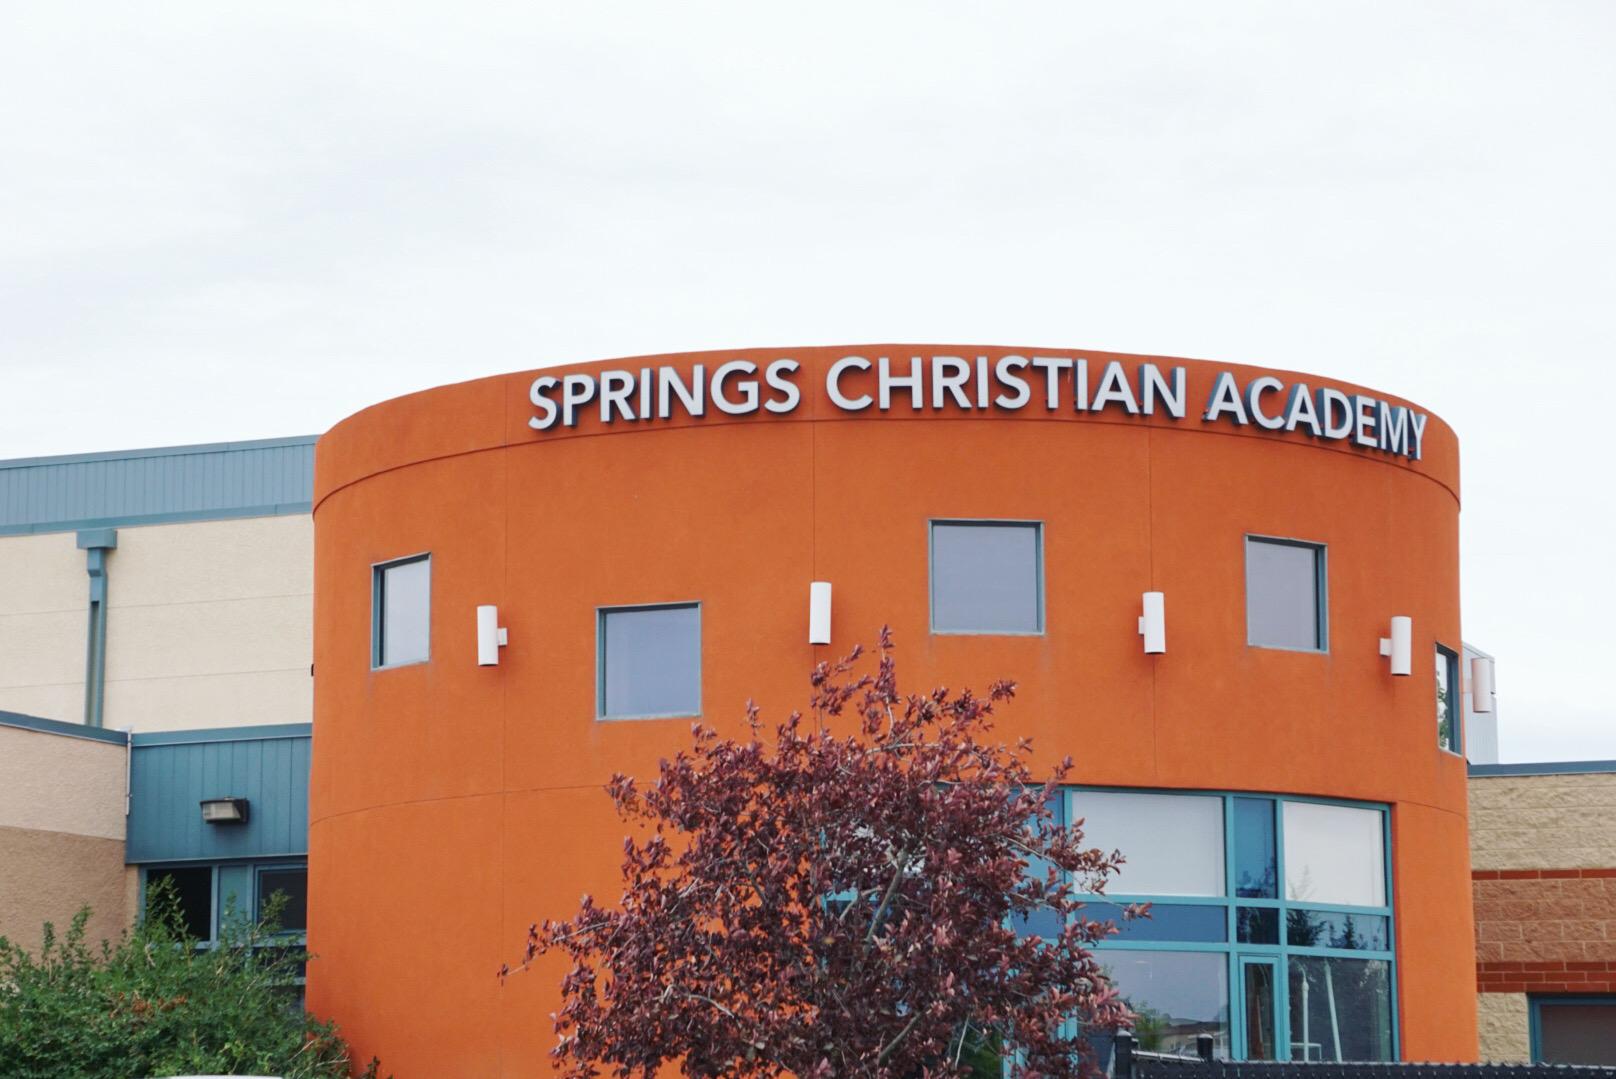 Springs Christian Academy (SCA) Building